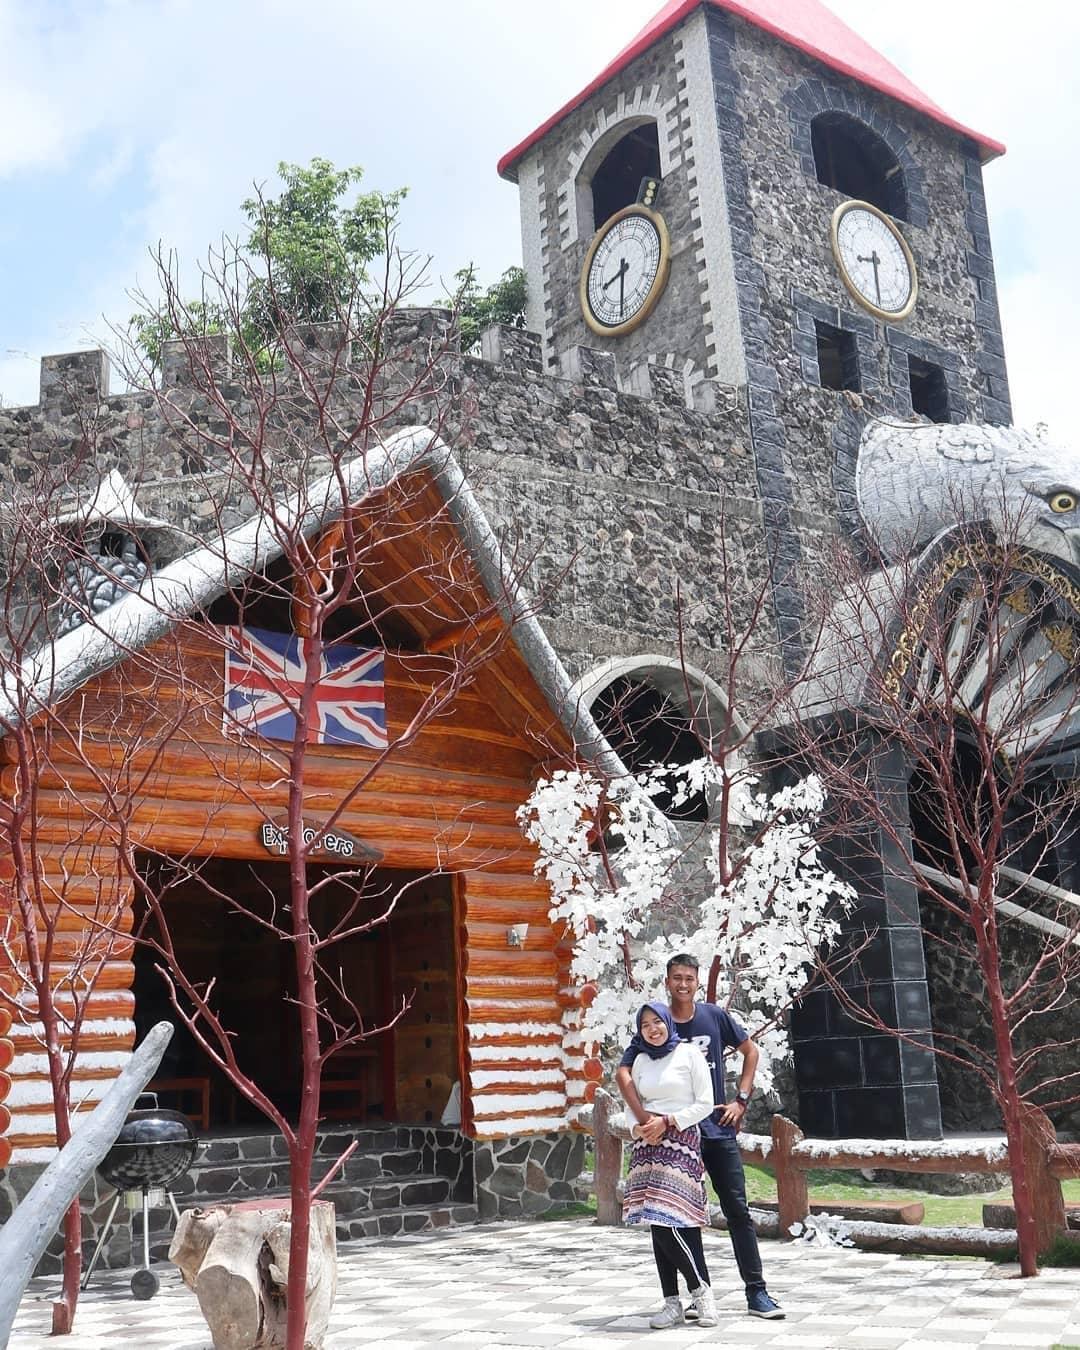 spot-foto-log-cabin-inggris-the-lost-world-castle